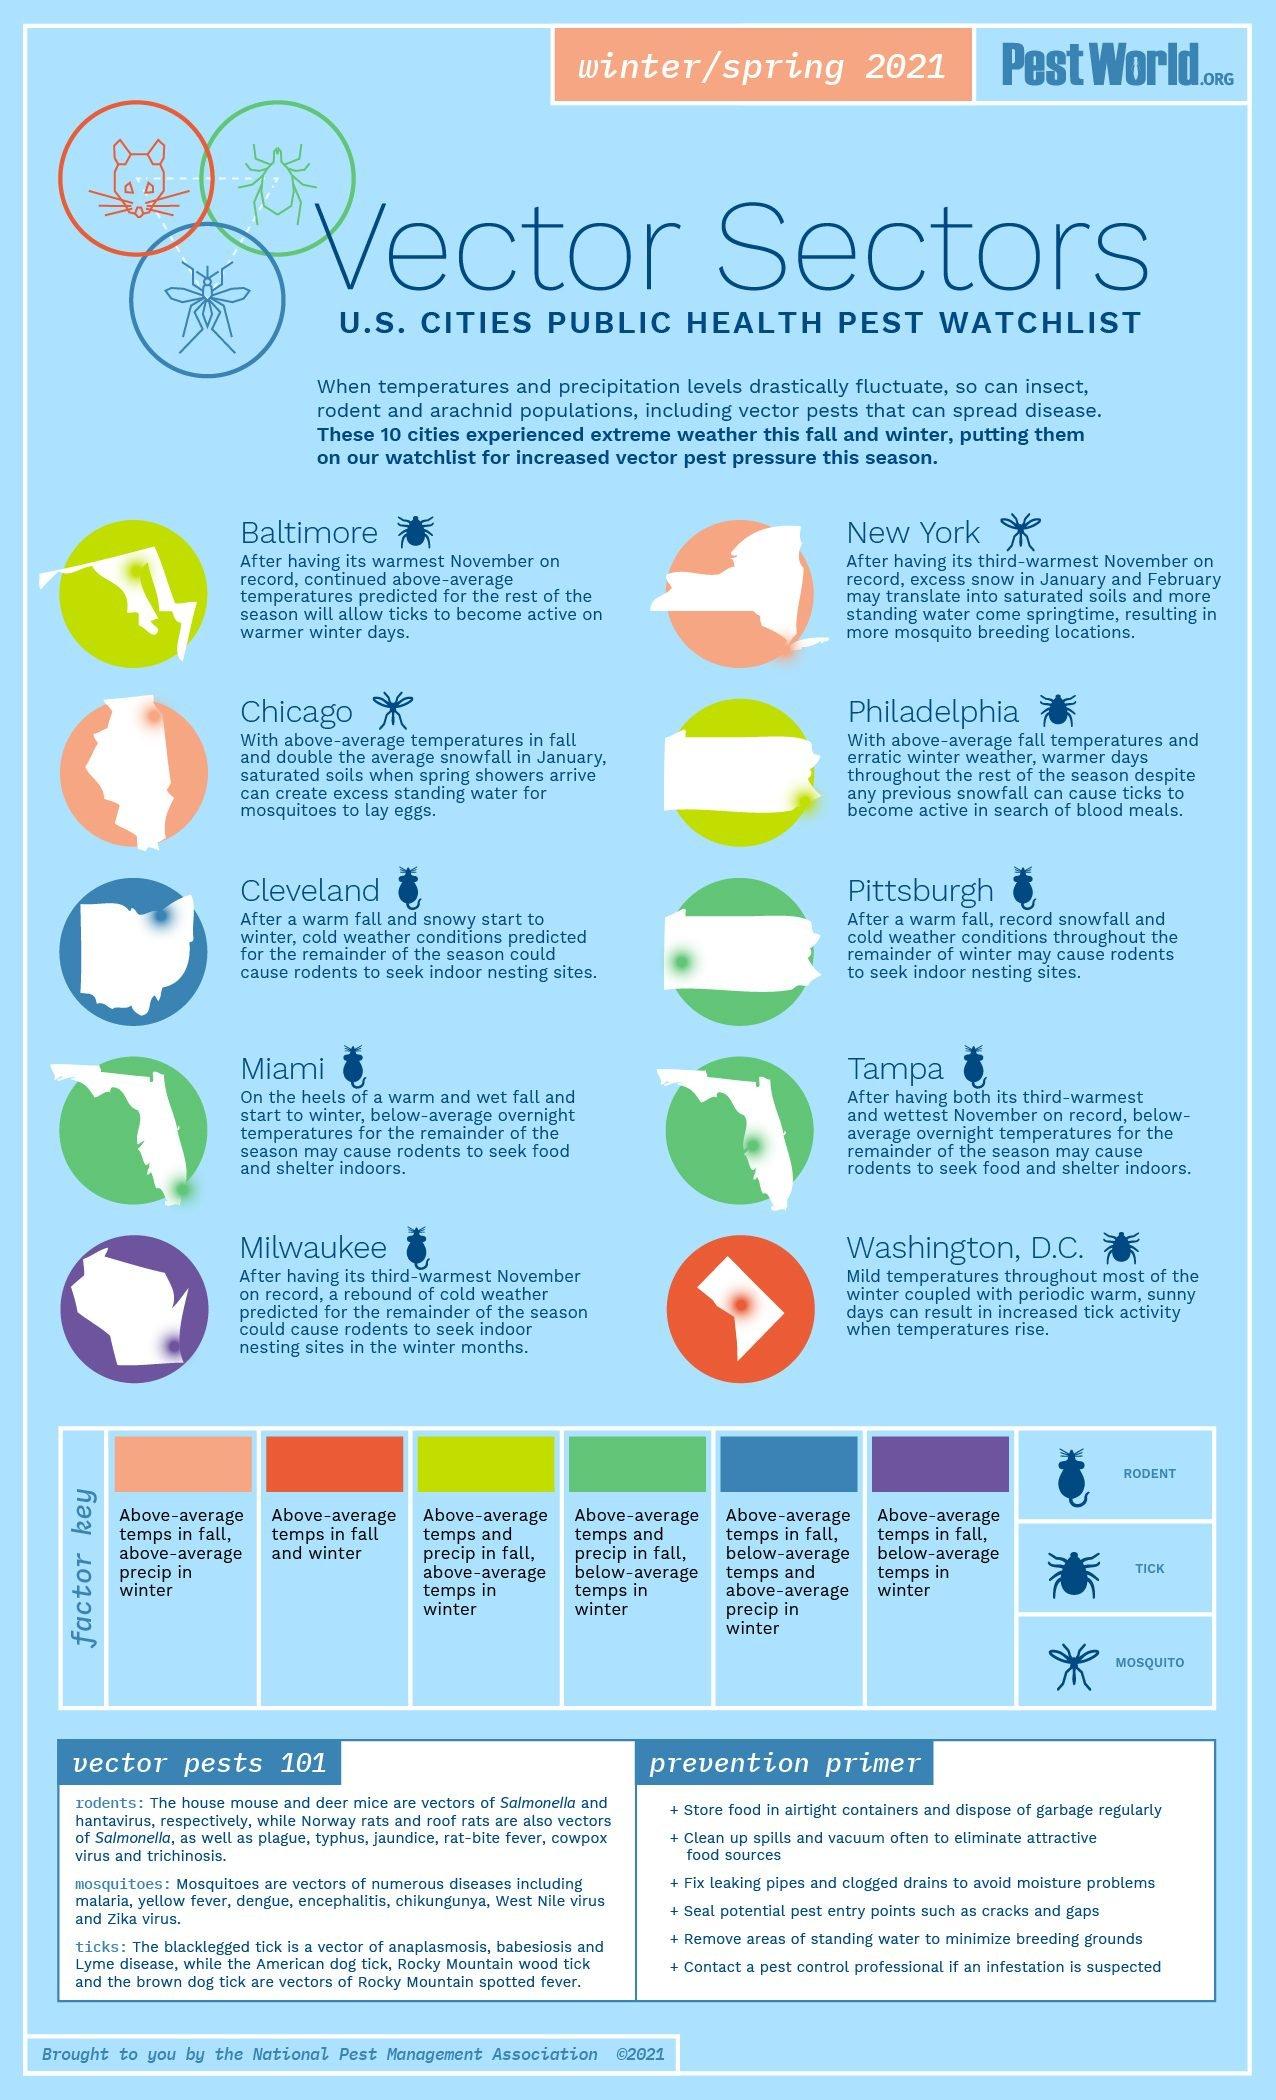 Us Cities Public Health Pest Watchlist Infographic